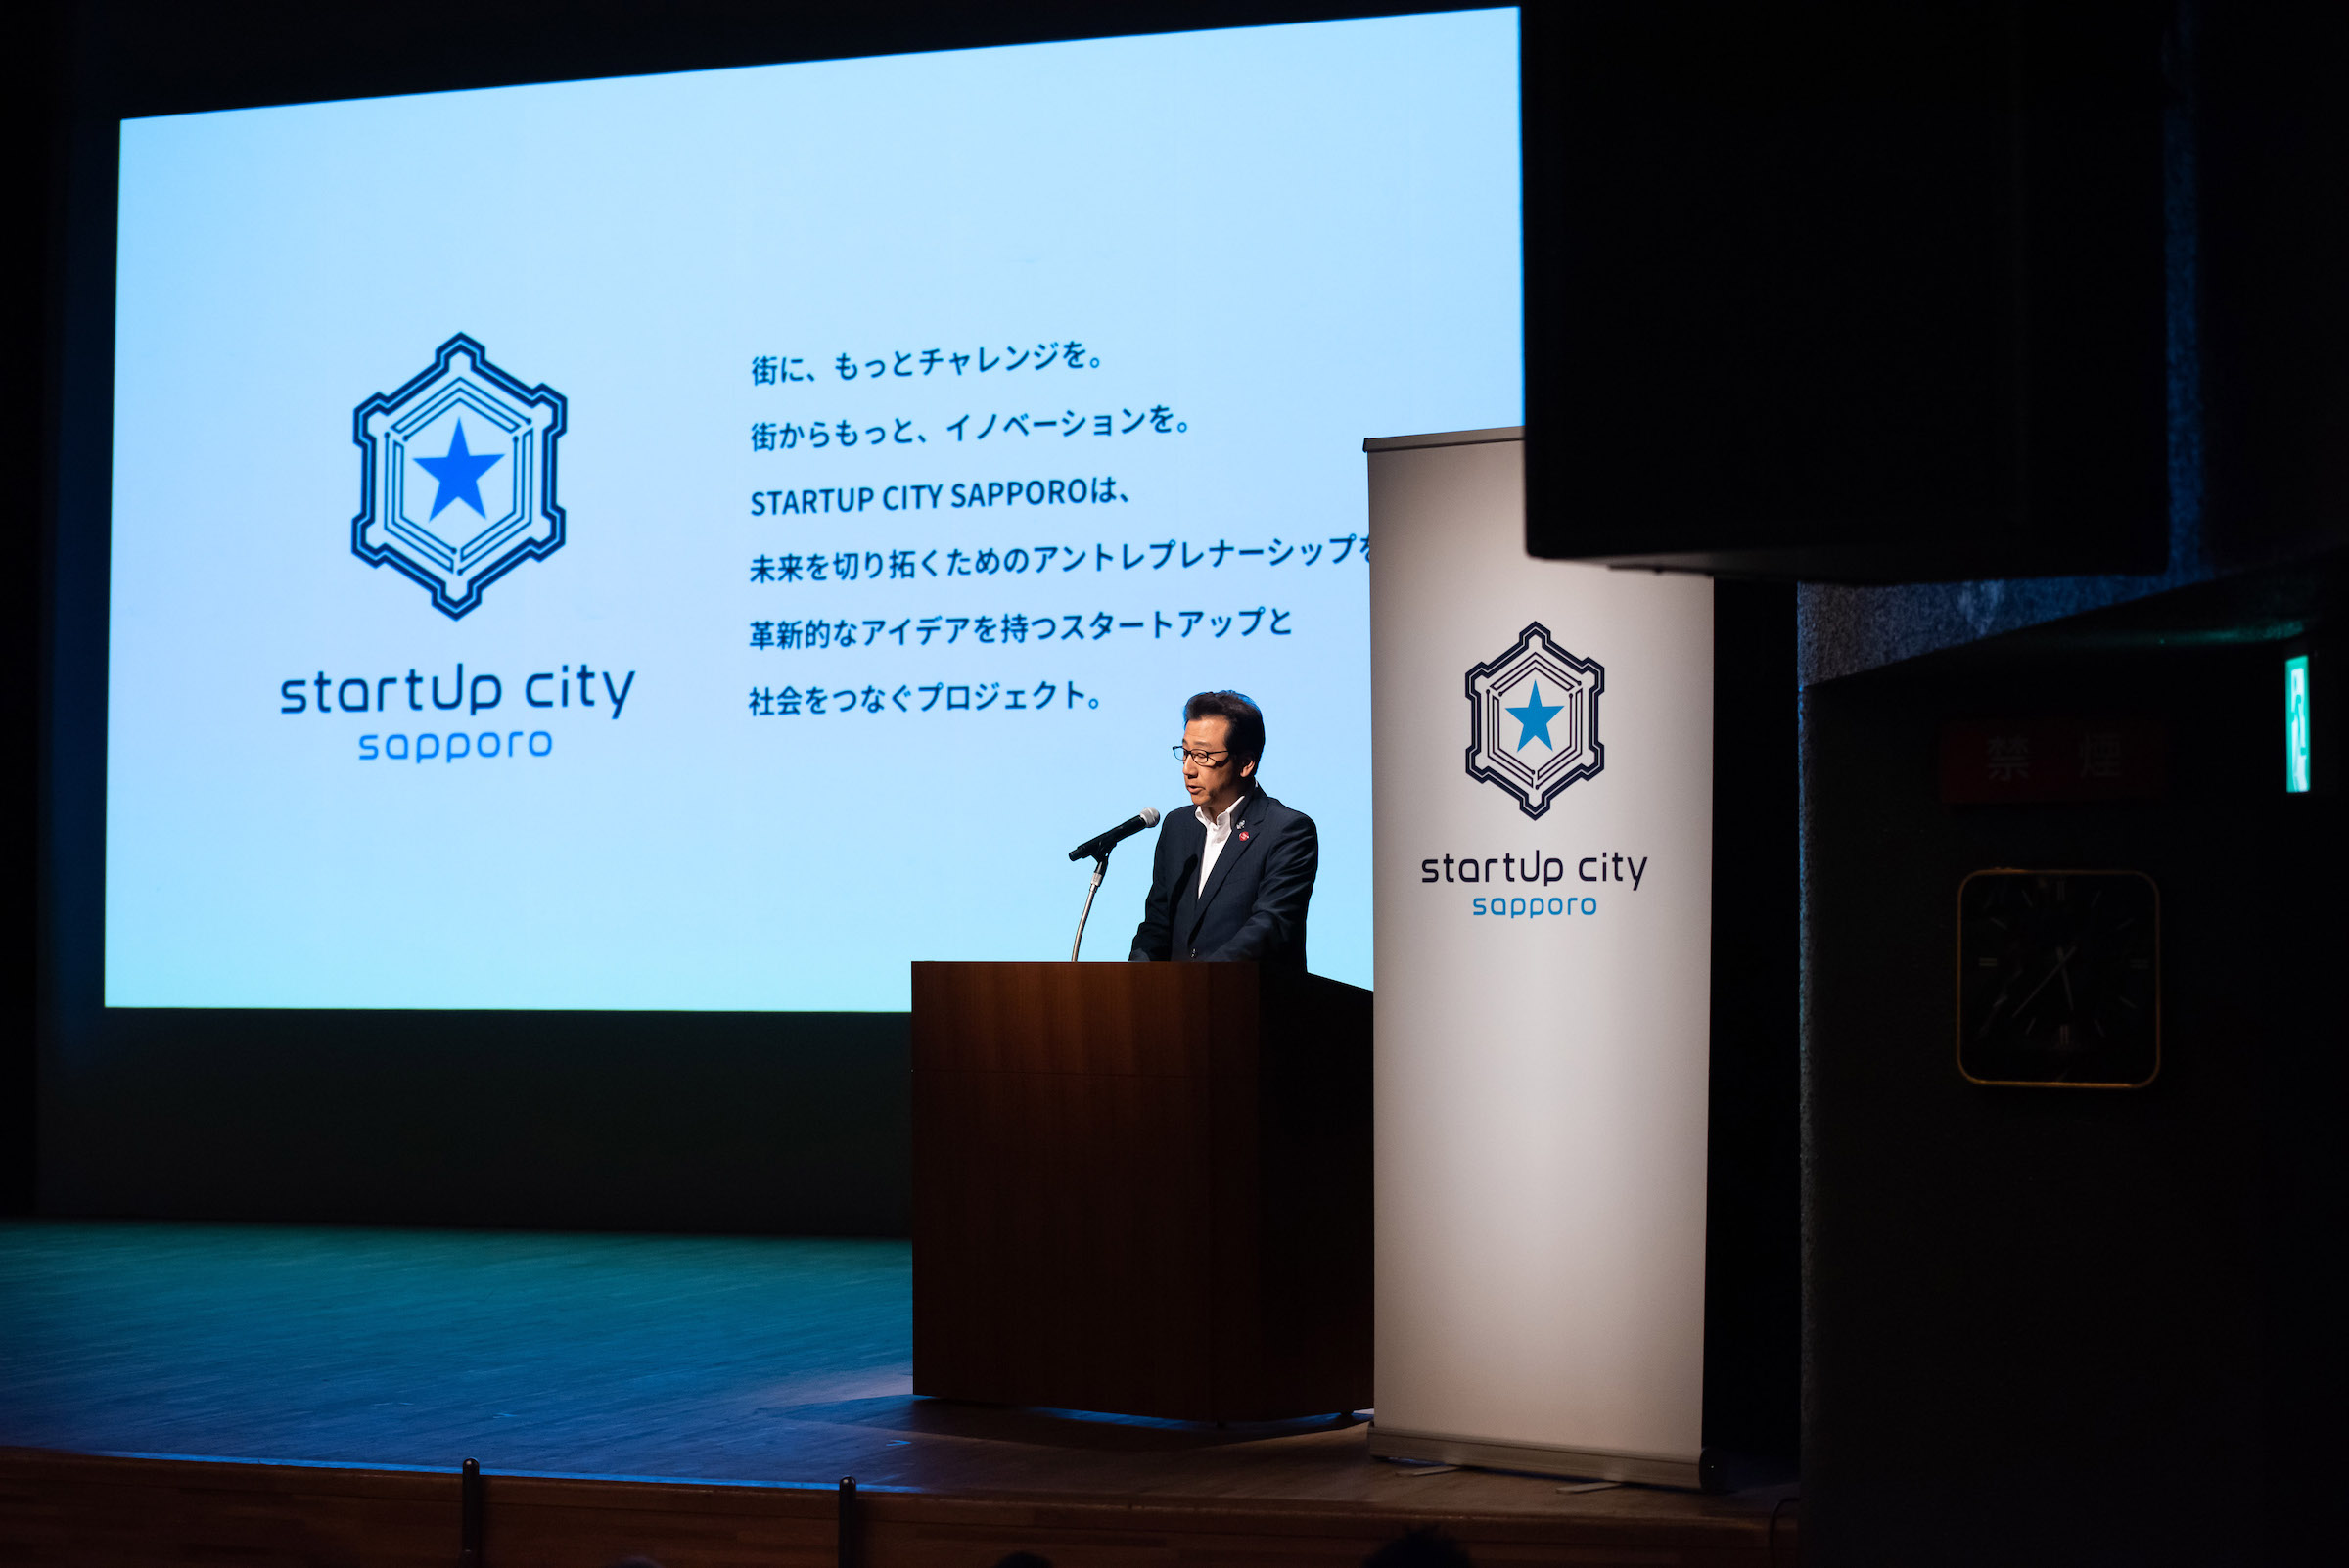 STRTUP CITY SAPPOROの概要を説明する秋元札幌市長